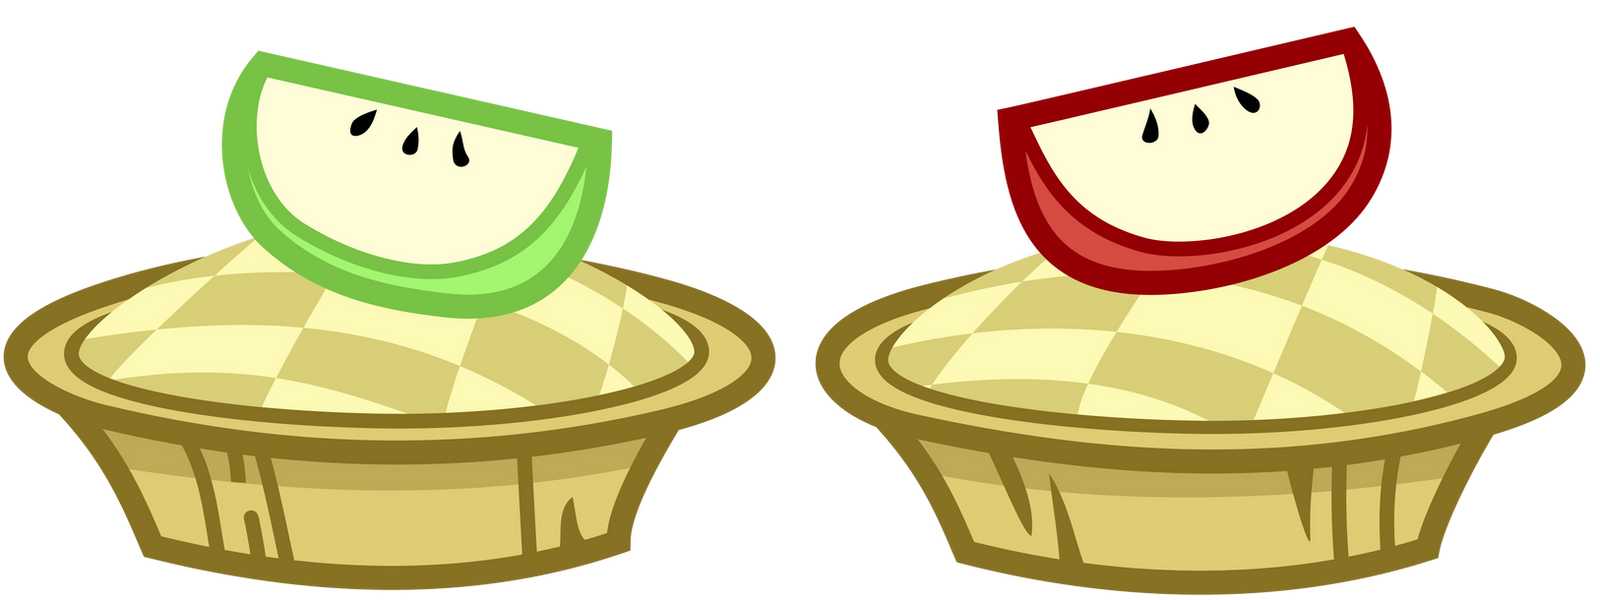 Applejack's Royal Wedding Bitesize Apple Fritters by 90Sigma